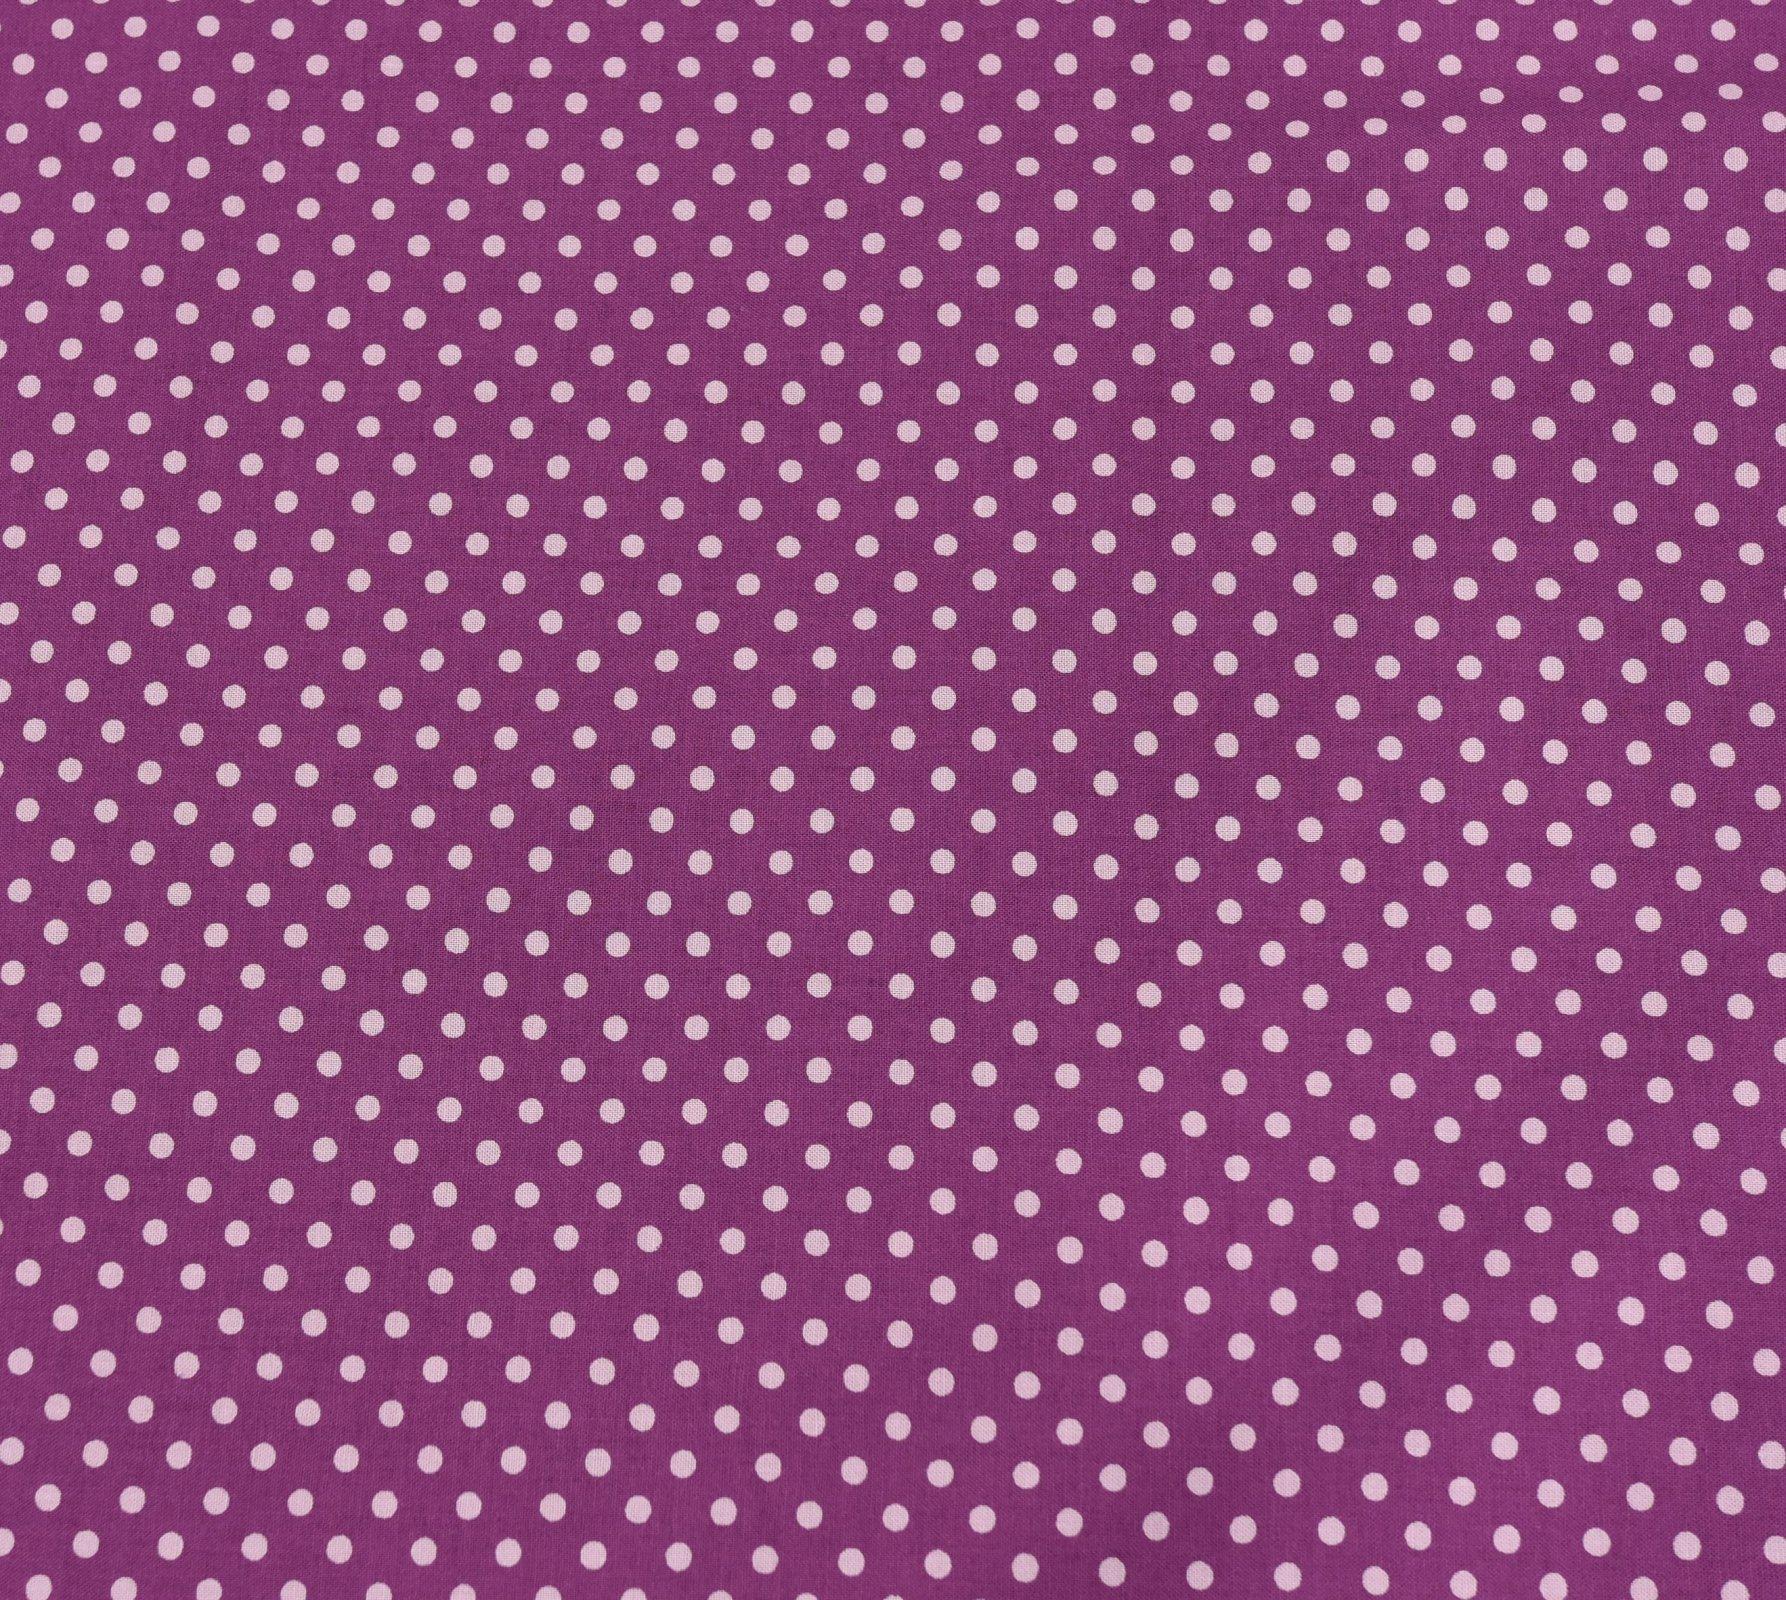 Sevenberry - Medium Dot - Pink on Purple